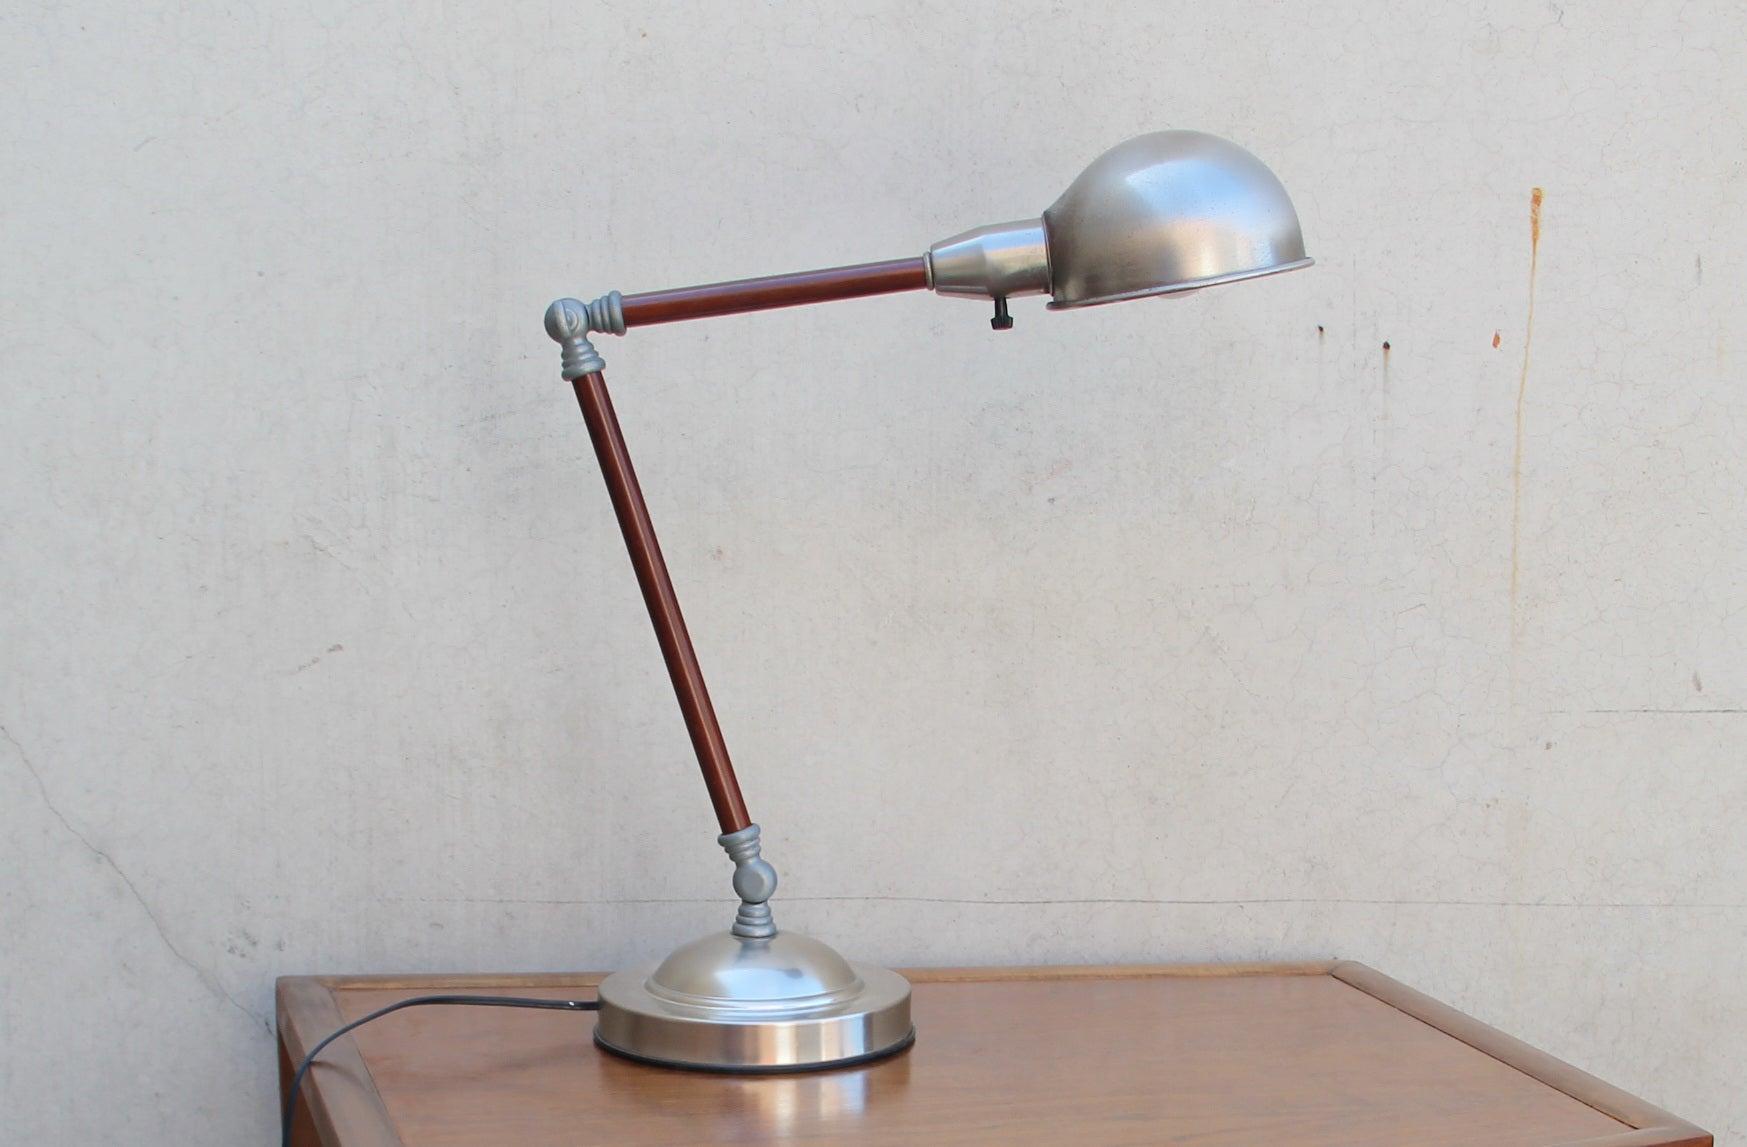 iridium interiors adjustable metal desk lamp with wood accent. Black Bedroom Furniture Sets. Home Design Ideas